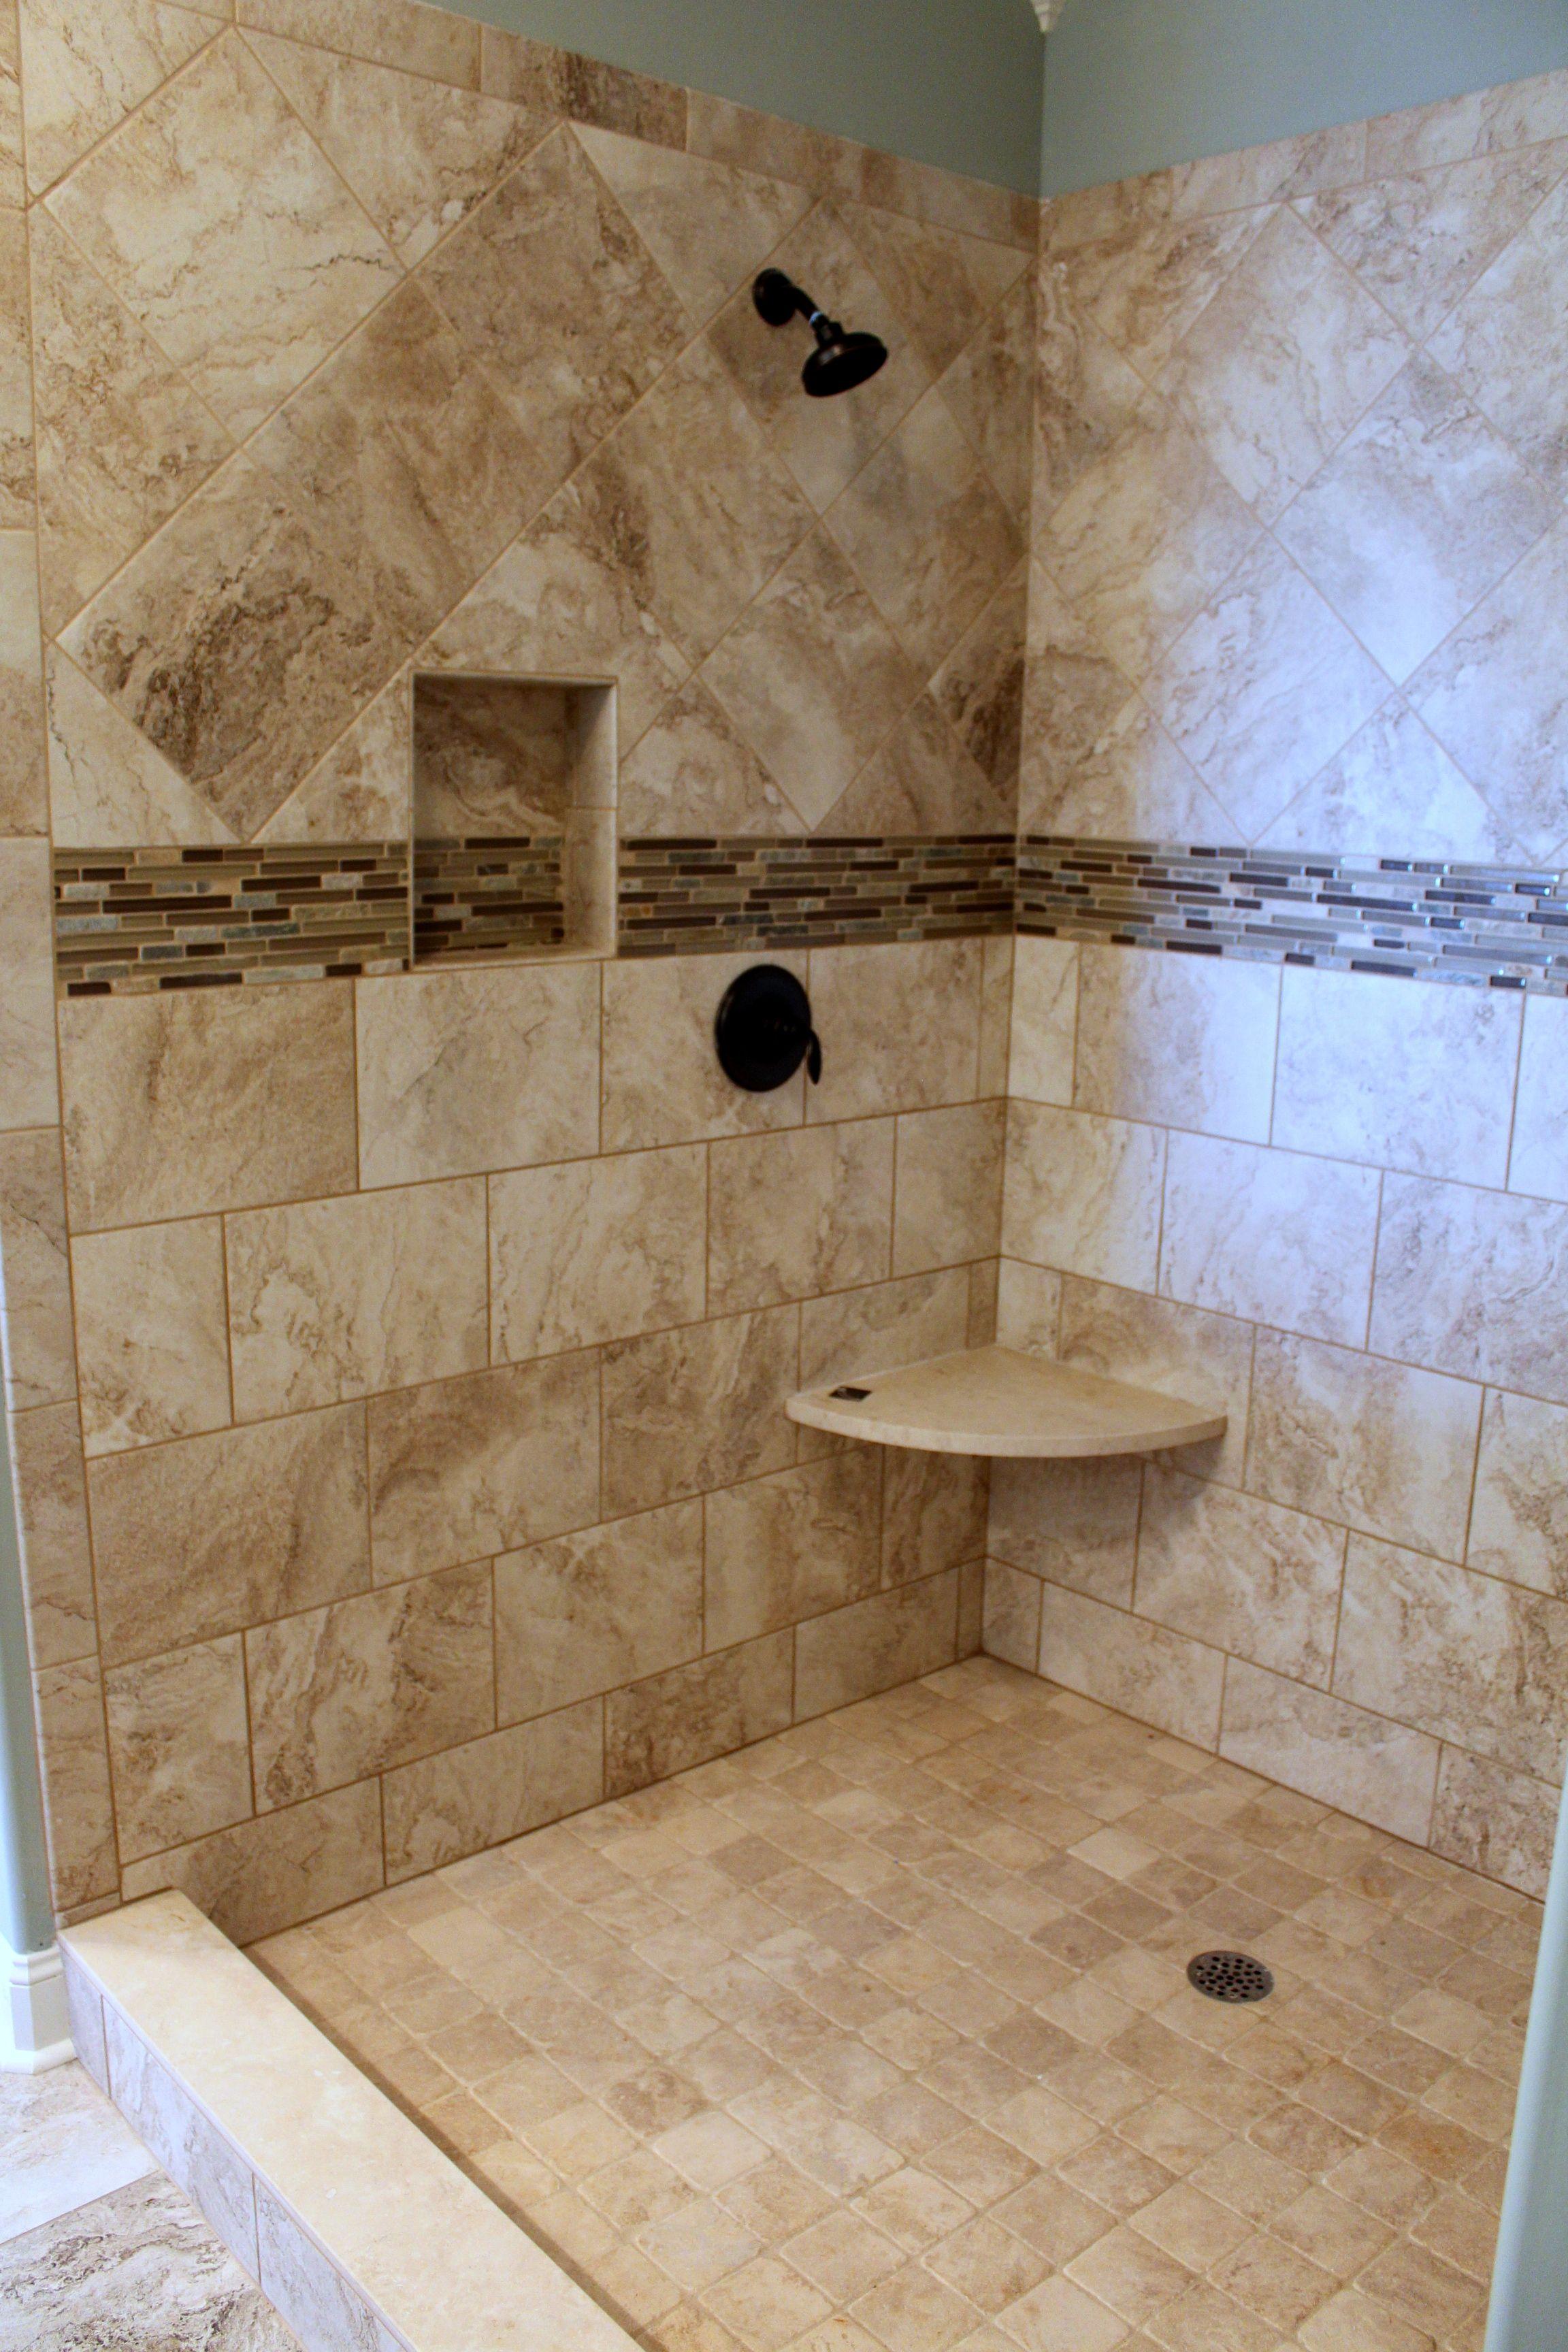 Best 25+ Border tiles ideas on Pinterest | Bathroom border ...